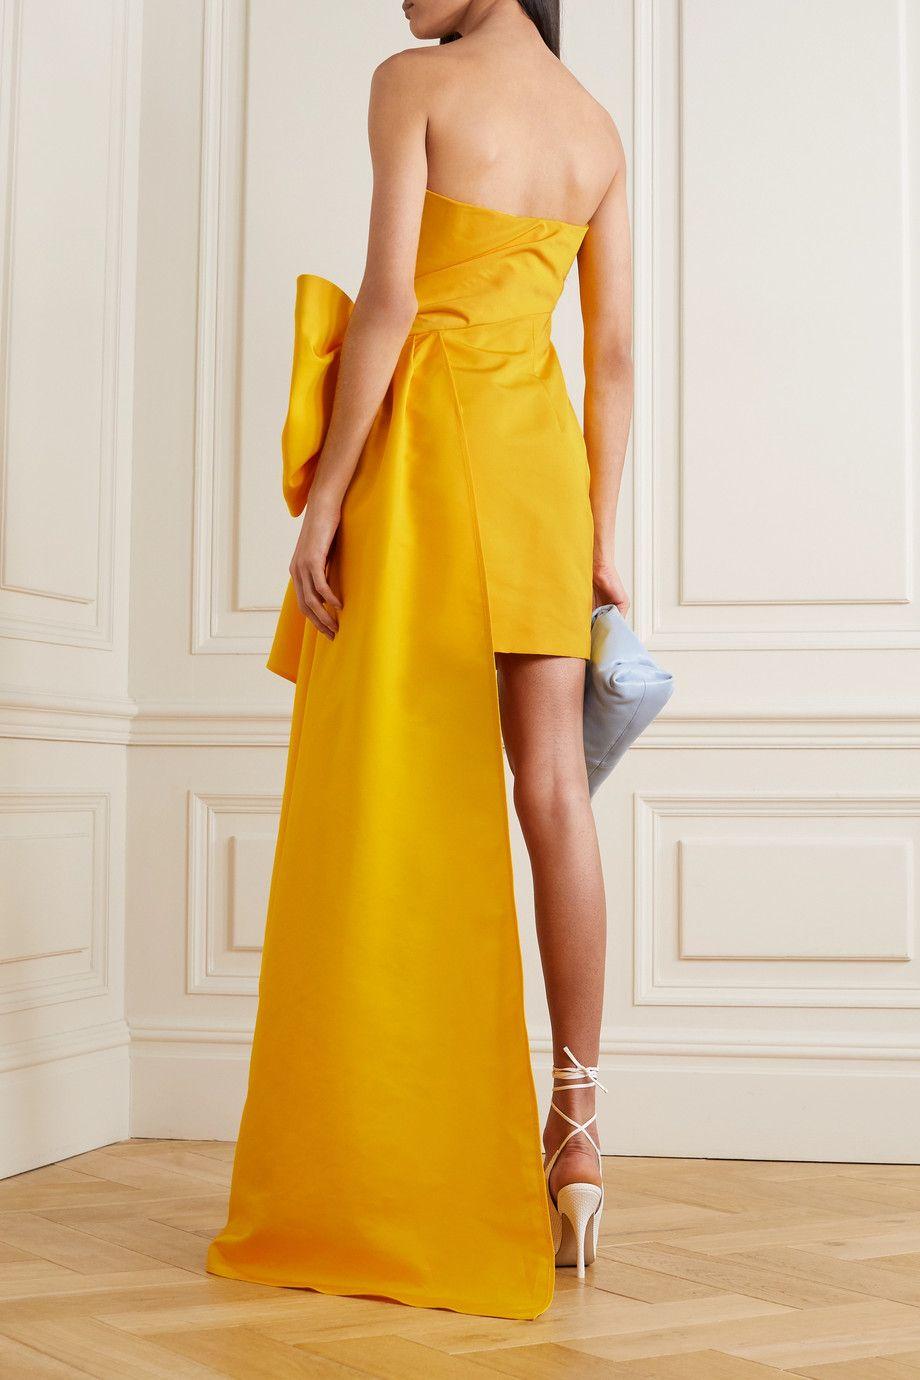 Yellow Strapless Draped Faille Mini Dress Carolina Herrera In 2021 Dresses Mini Dress Strapless Dress Formal [ 1380 x 920 Pixel ]